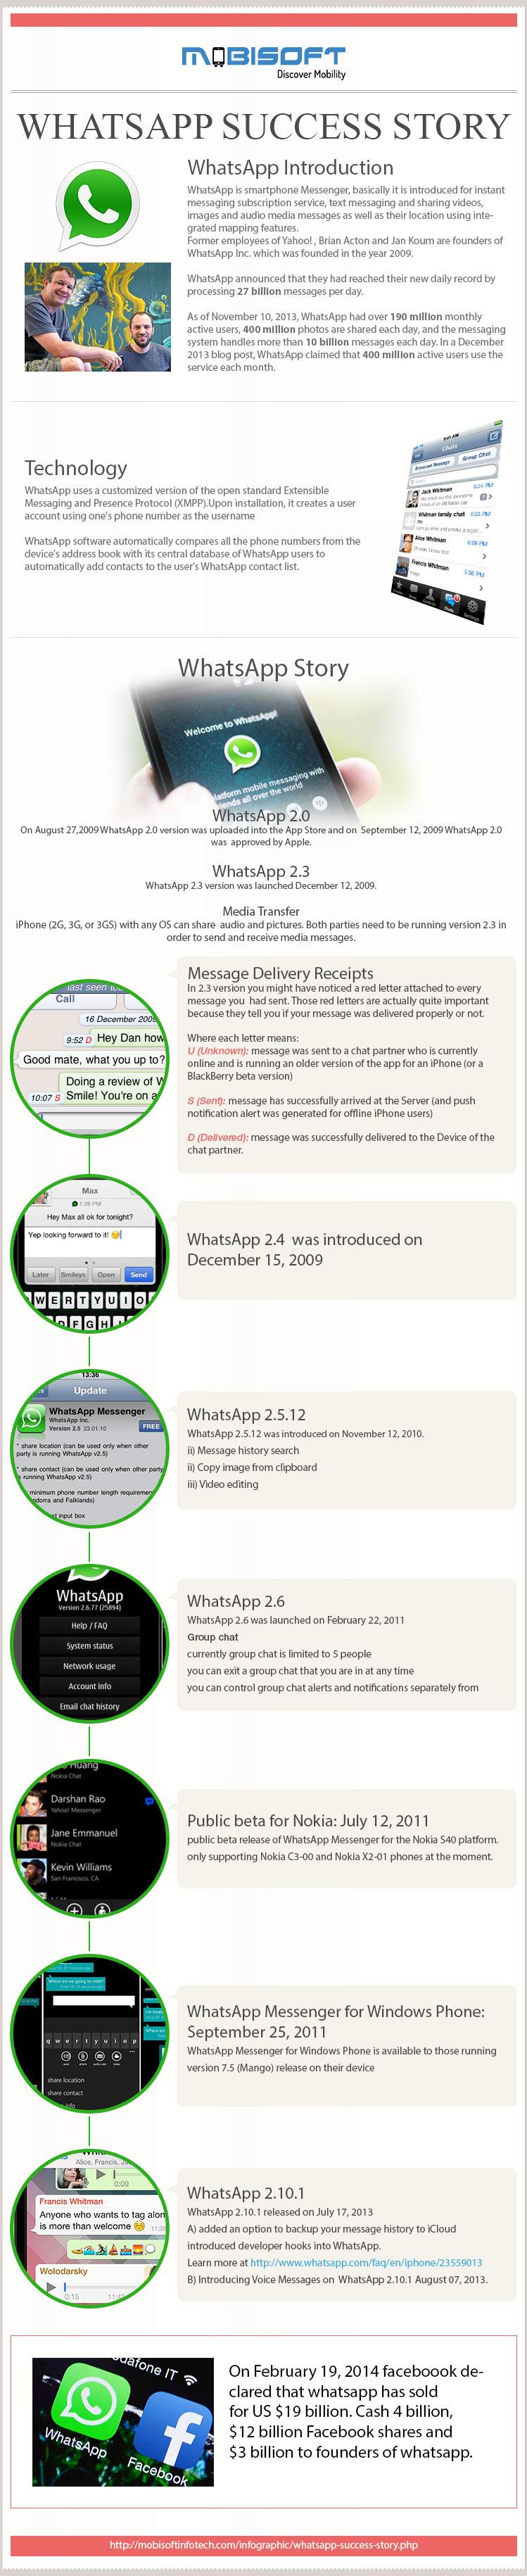 Whatsapp: historia de un éxito